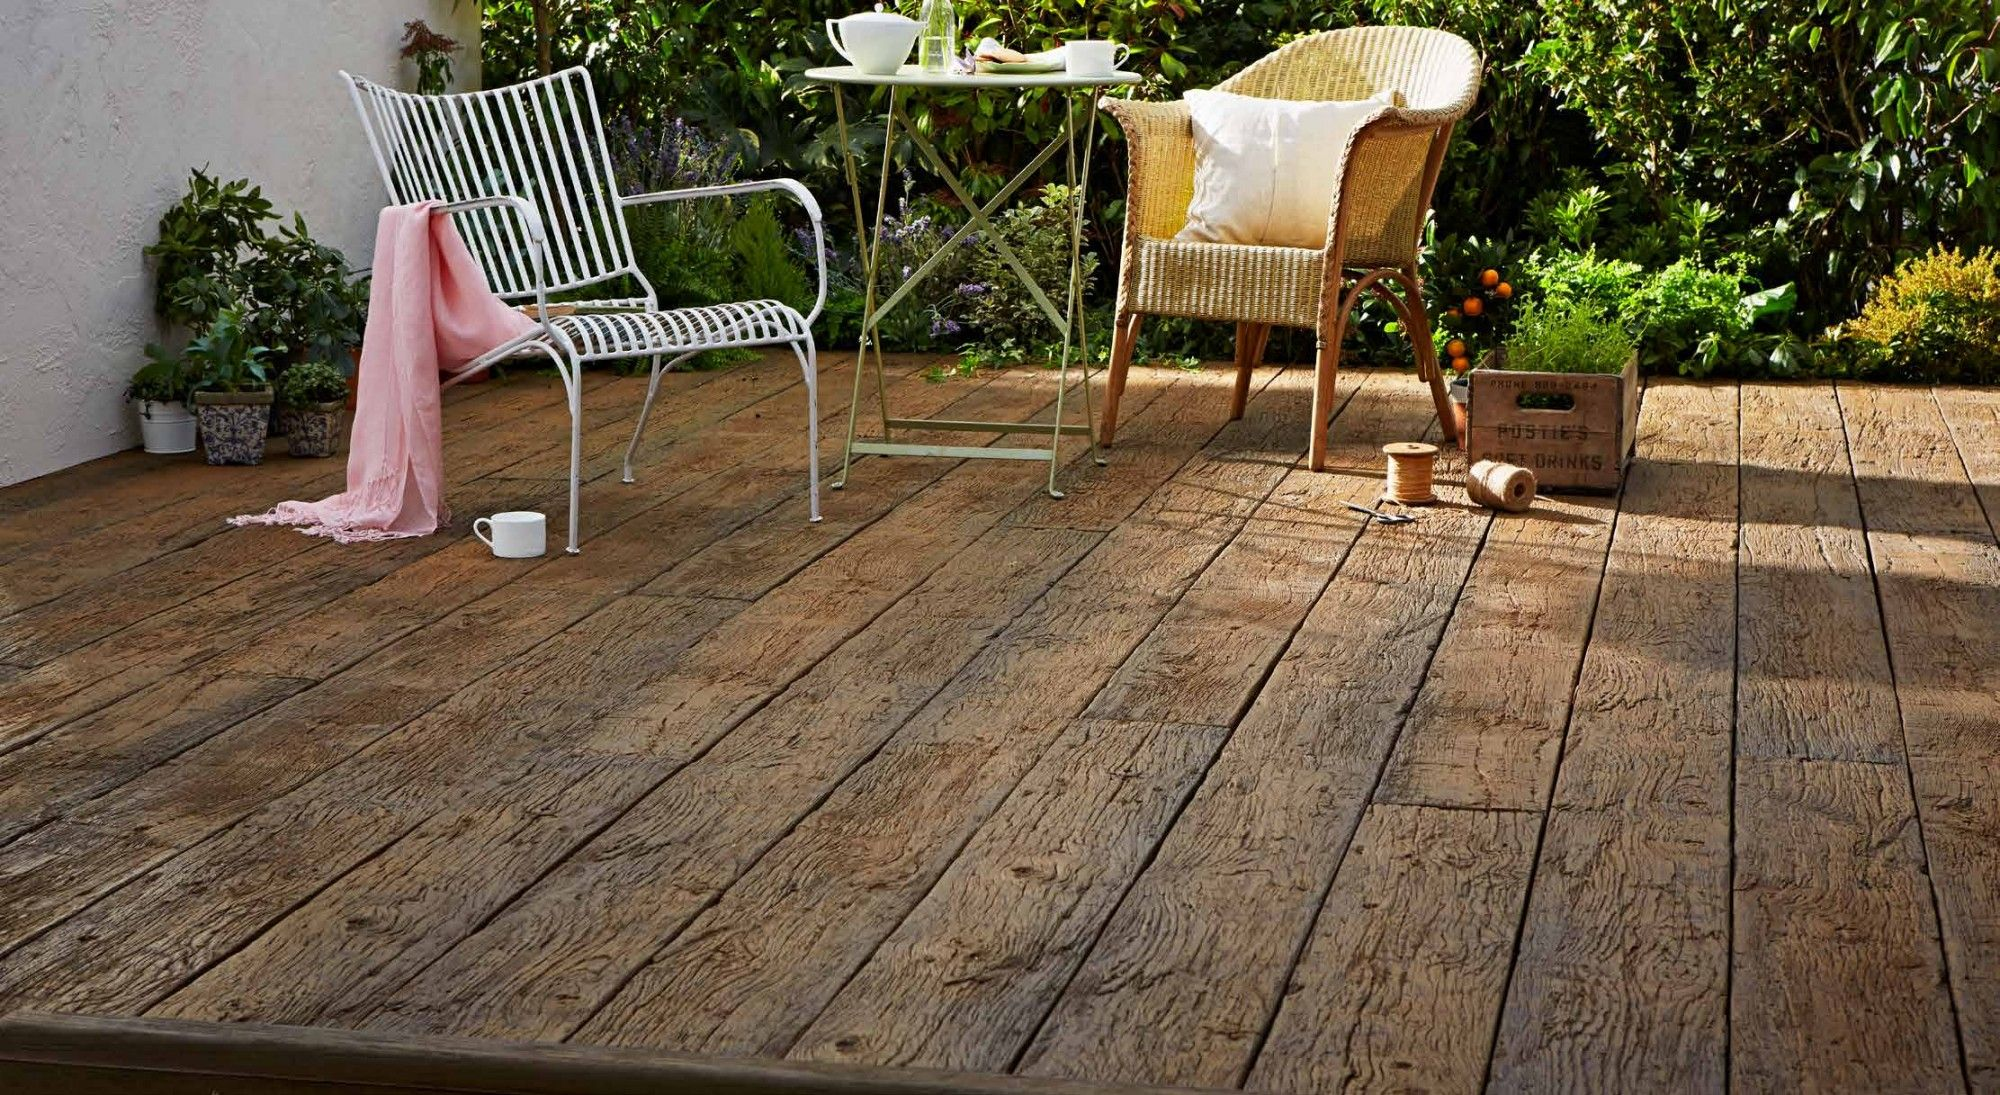 Millboard garden decking example type weathered oak taken for Garden decking examples